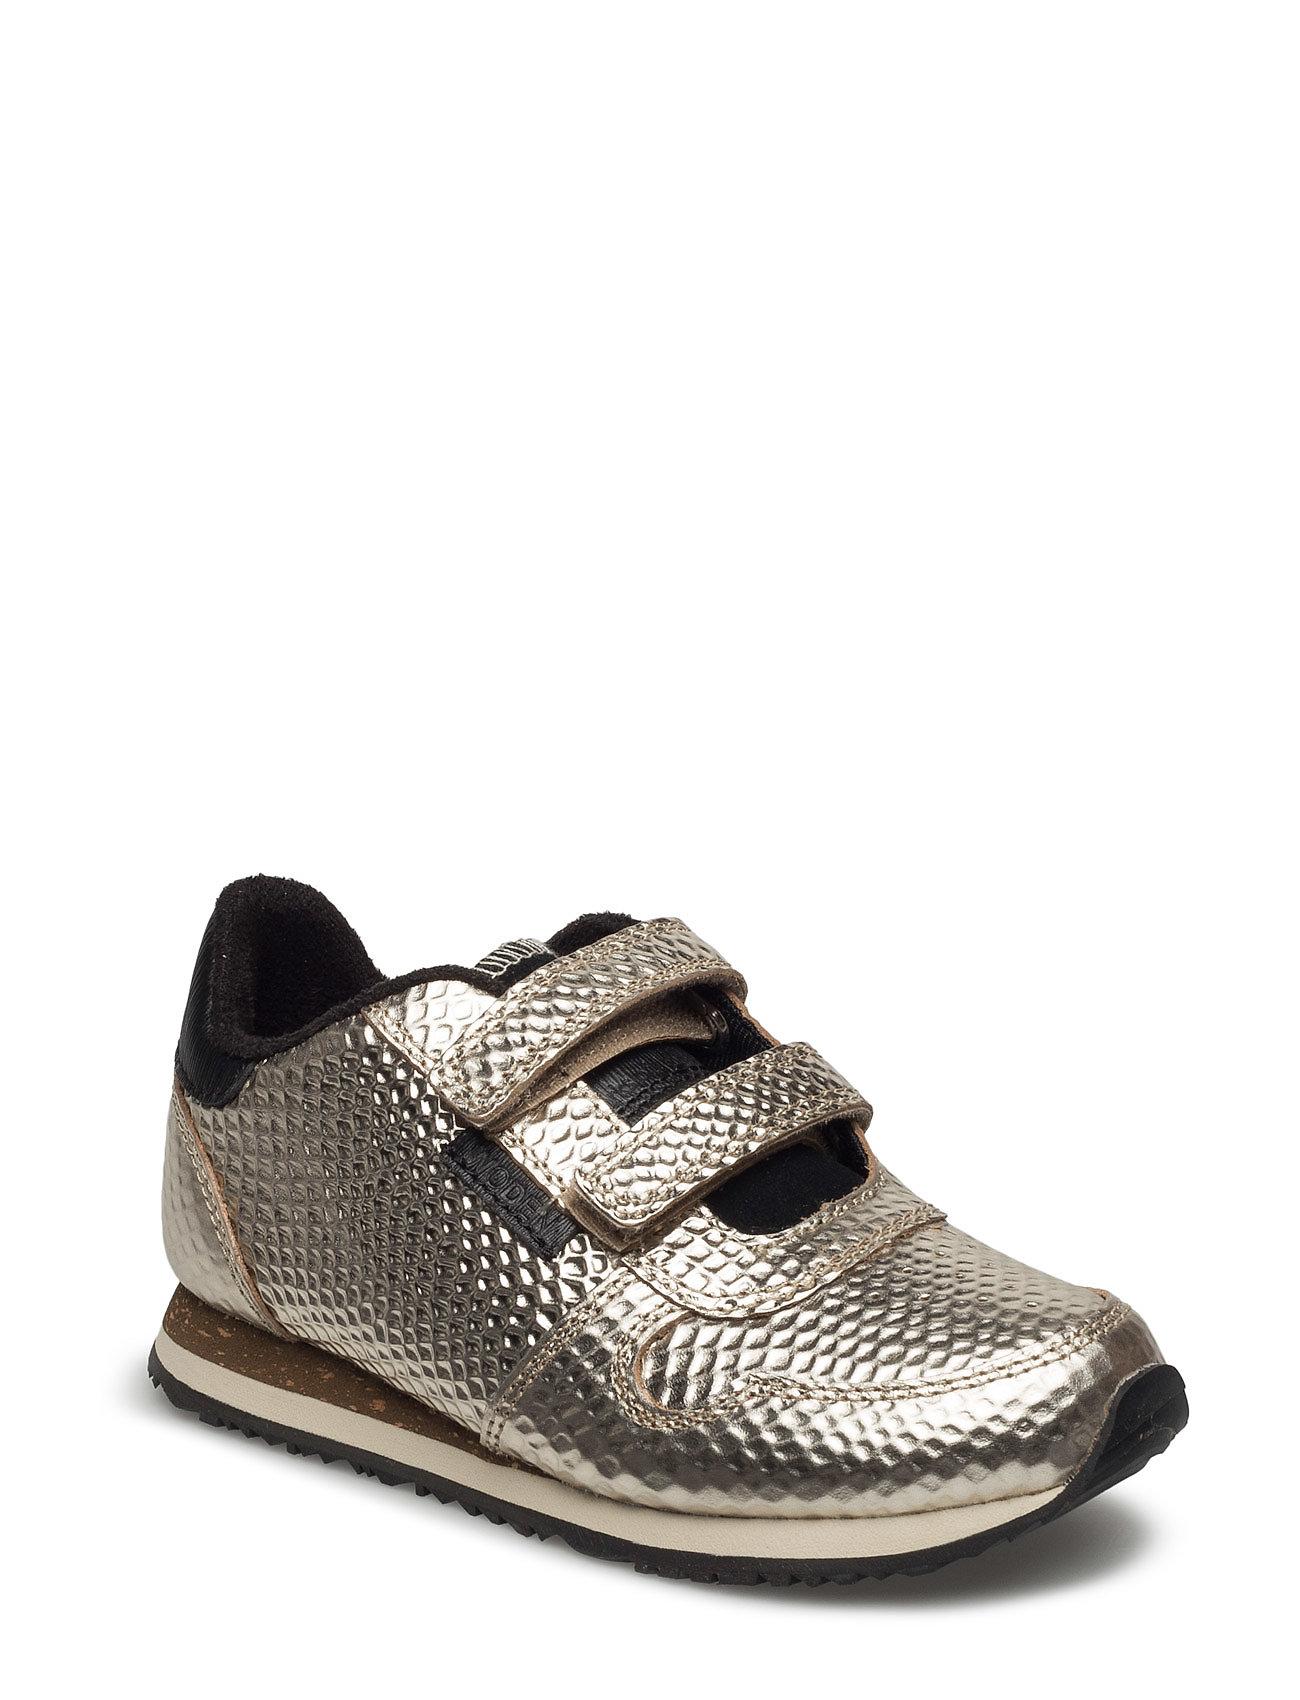 Ydun Metalic Jr Woden Sko & Sneakers til Børn i Guld